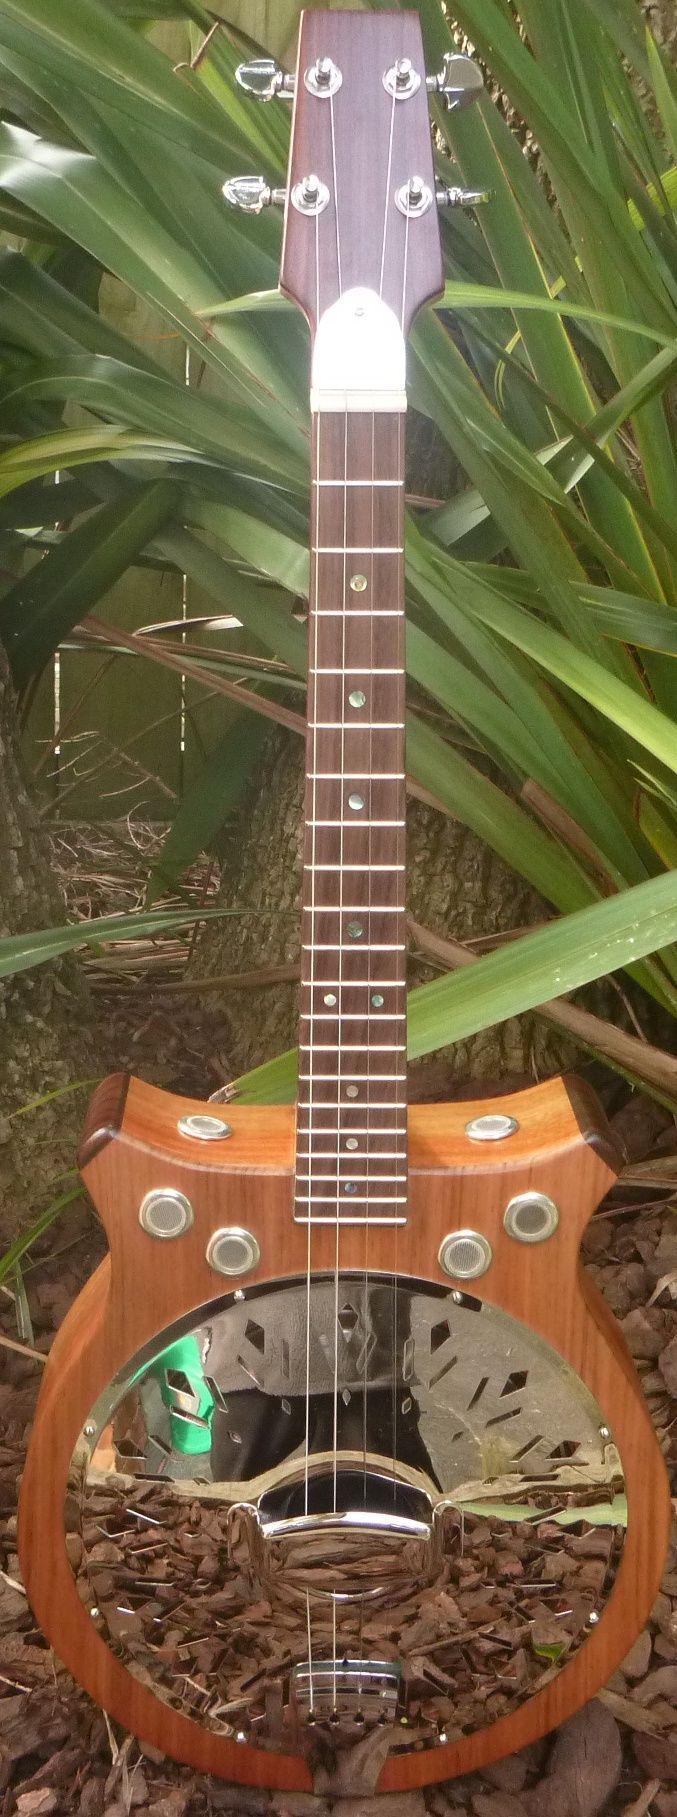 sex-ray-asian-resonator-guitar-manufacturer-xxx